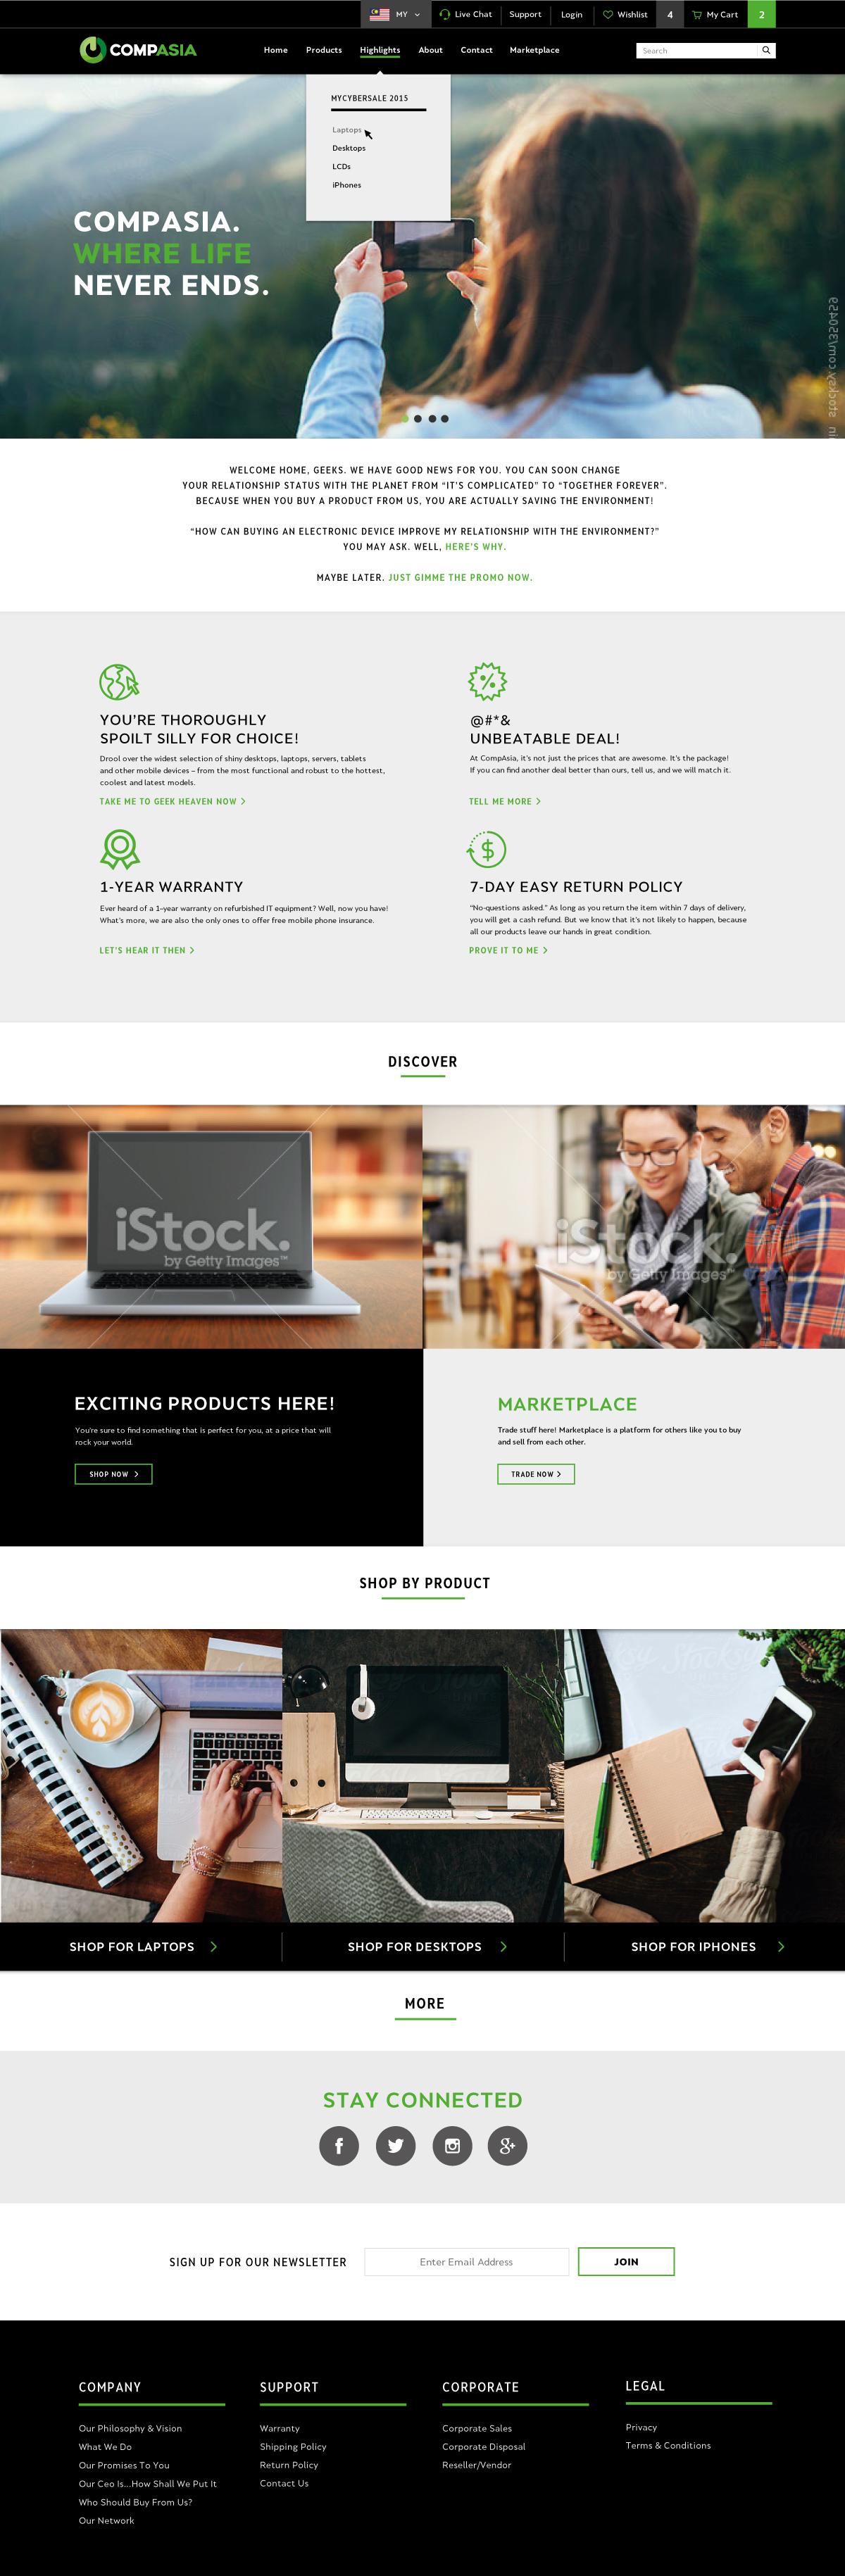 CompAsia Website Design